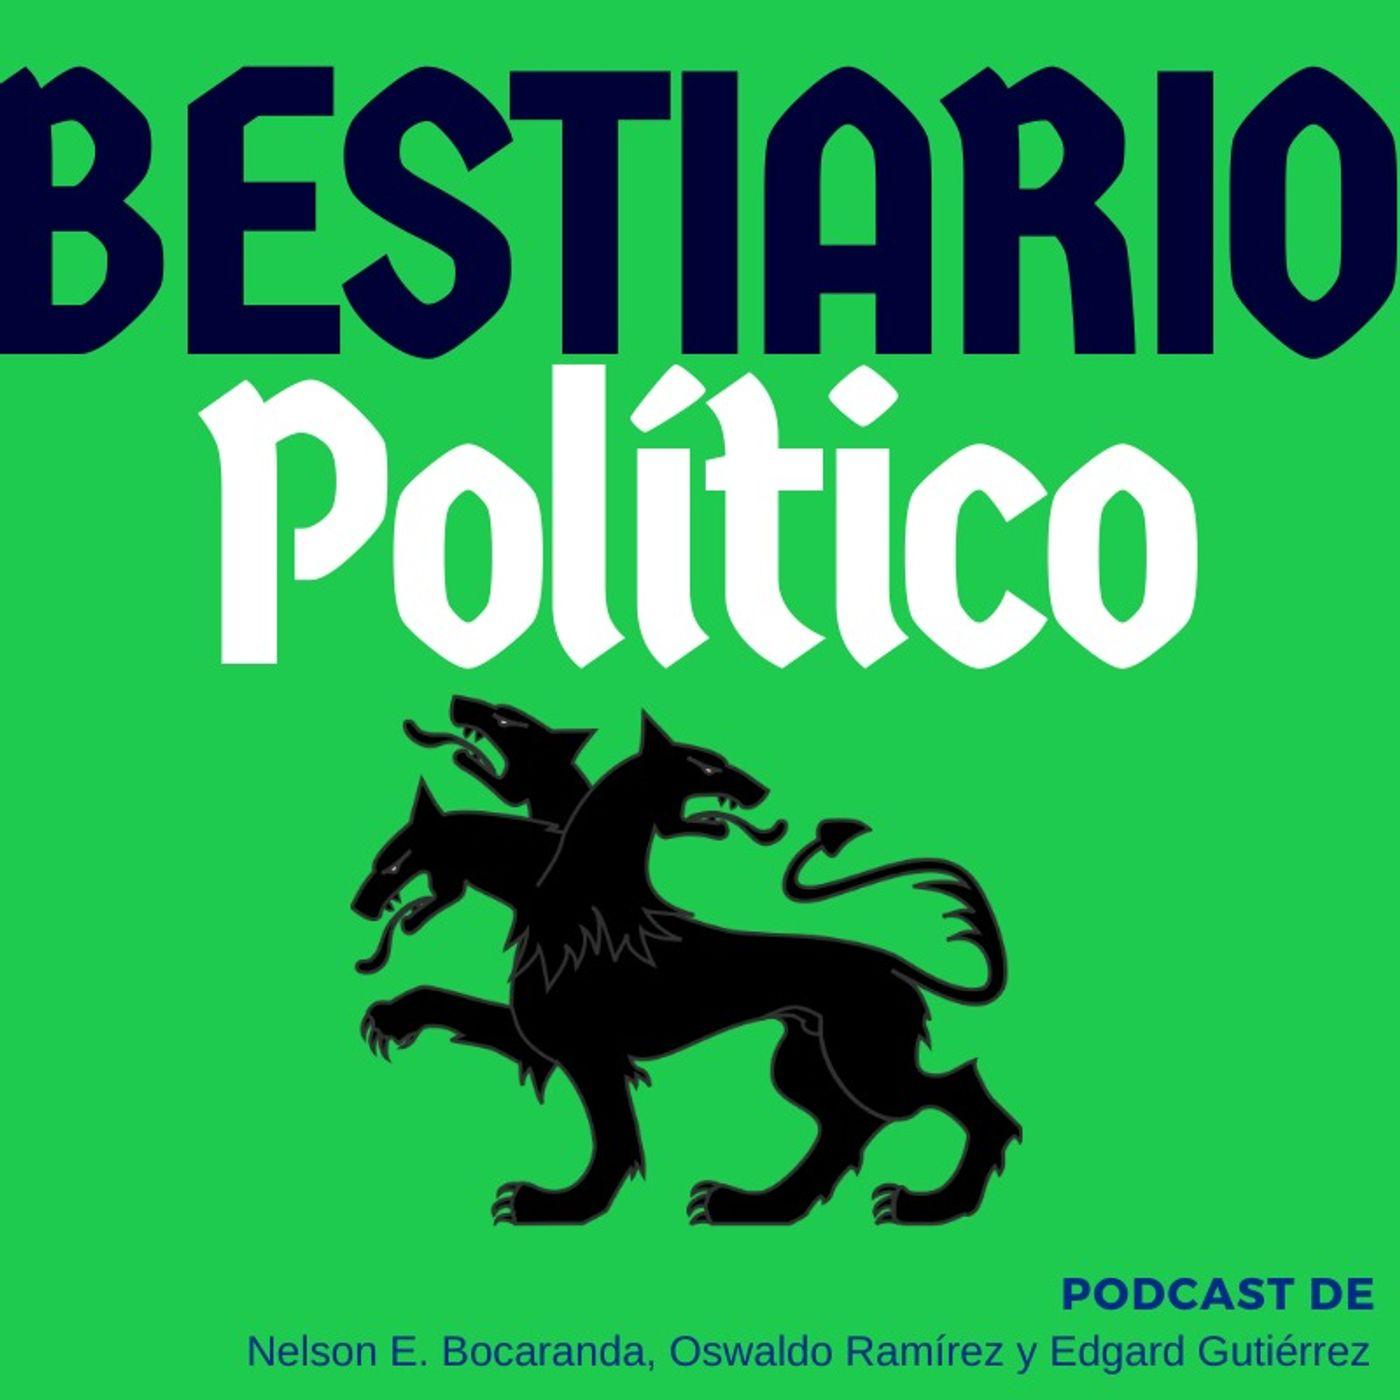 Bestiario Politico